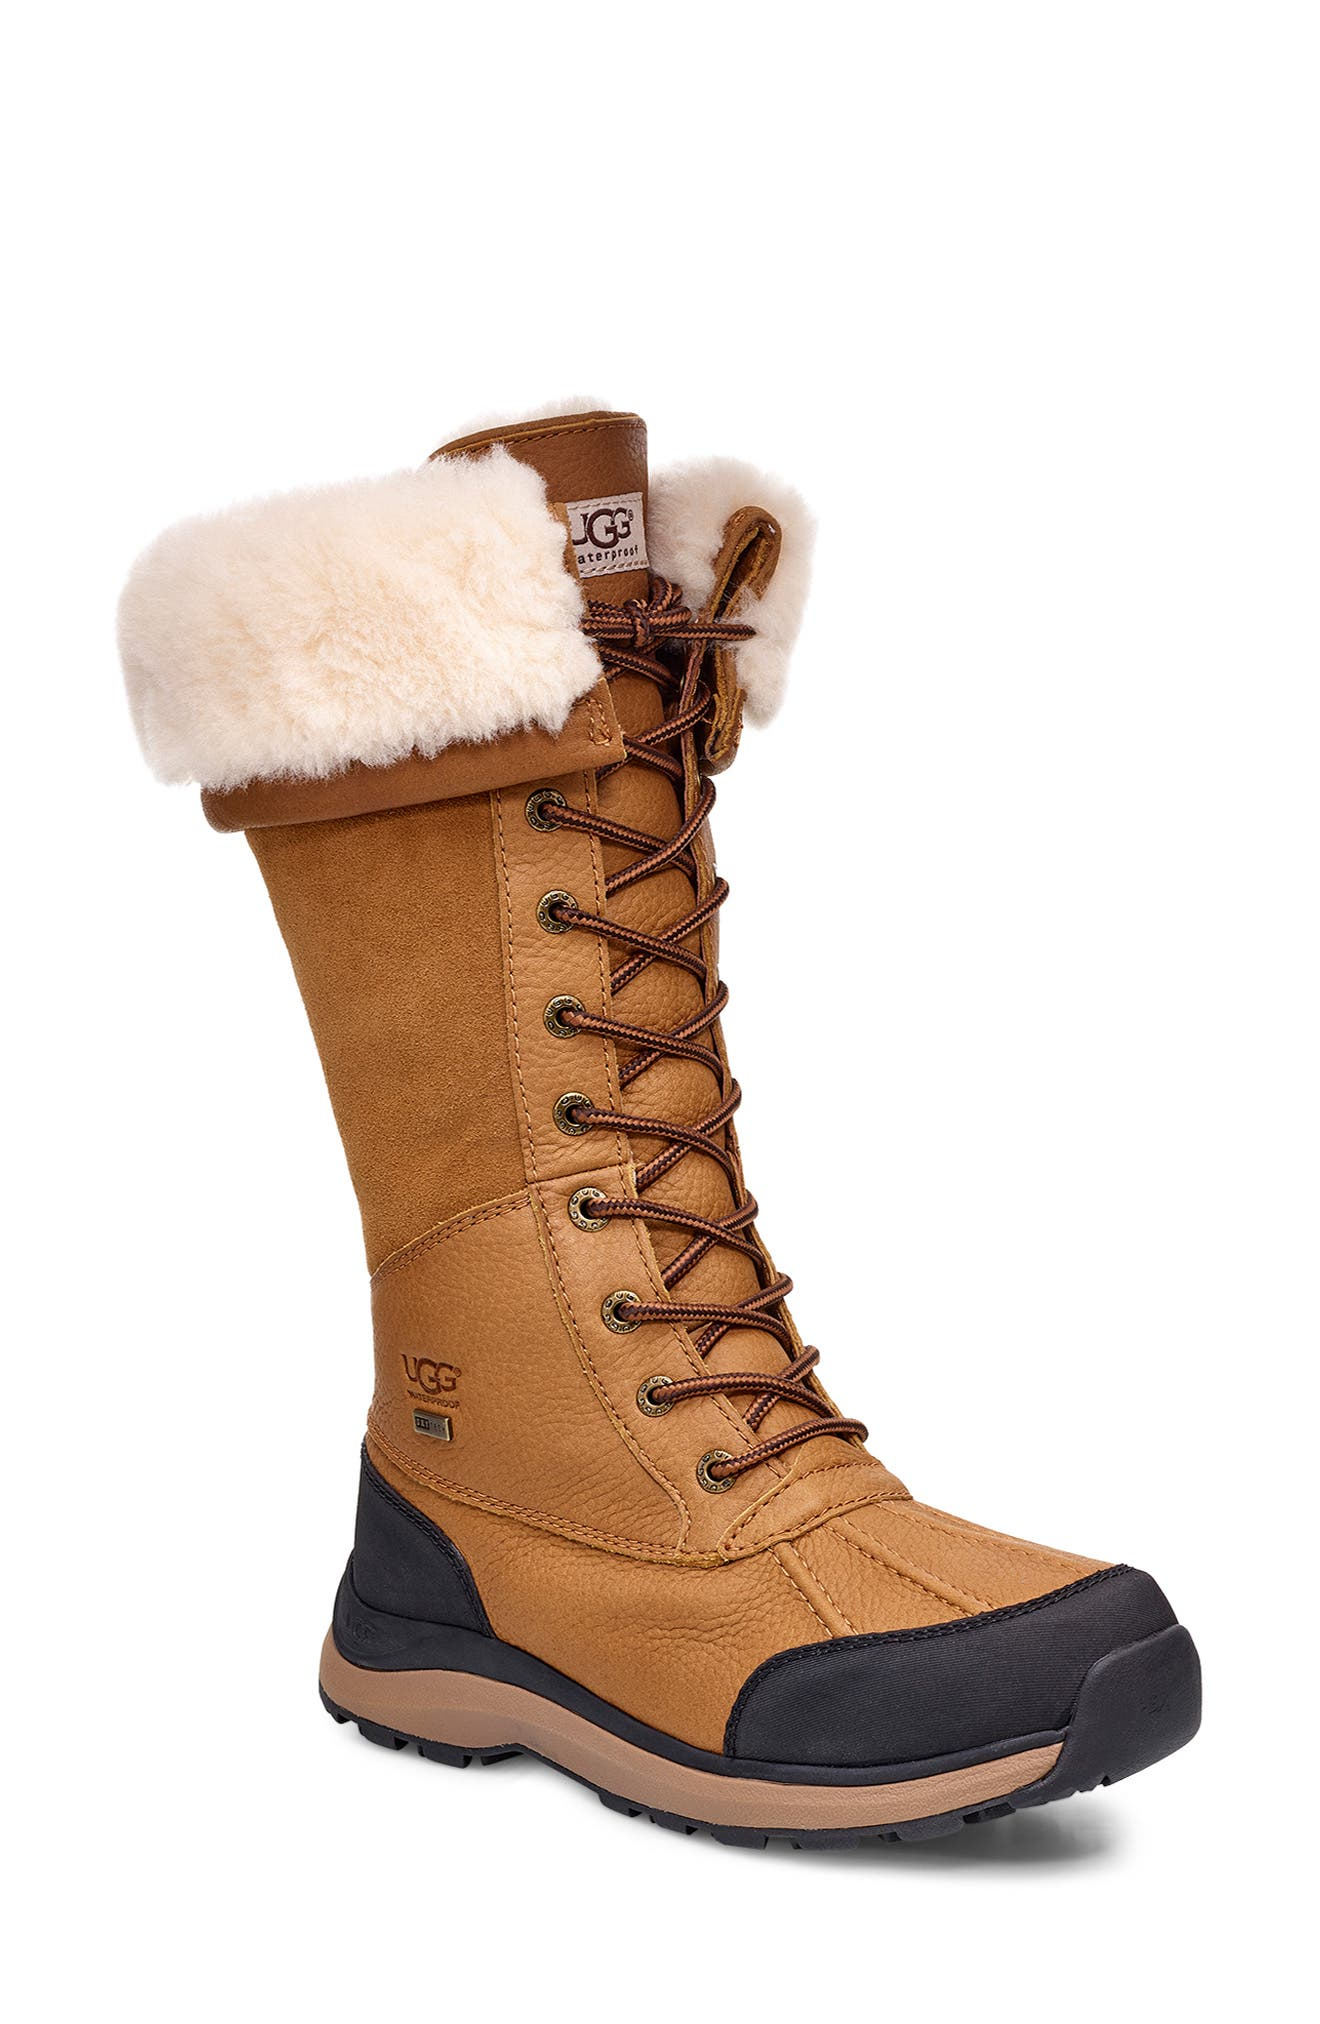 Adirondack Ii Waterproof Tall Boot by Ugg®